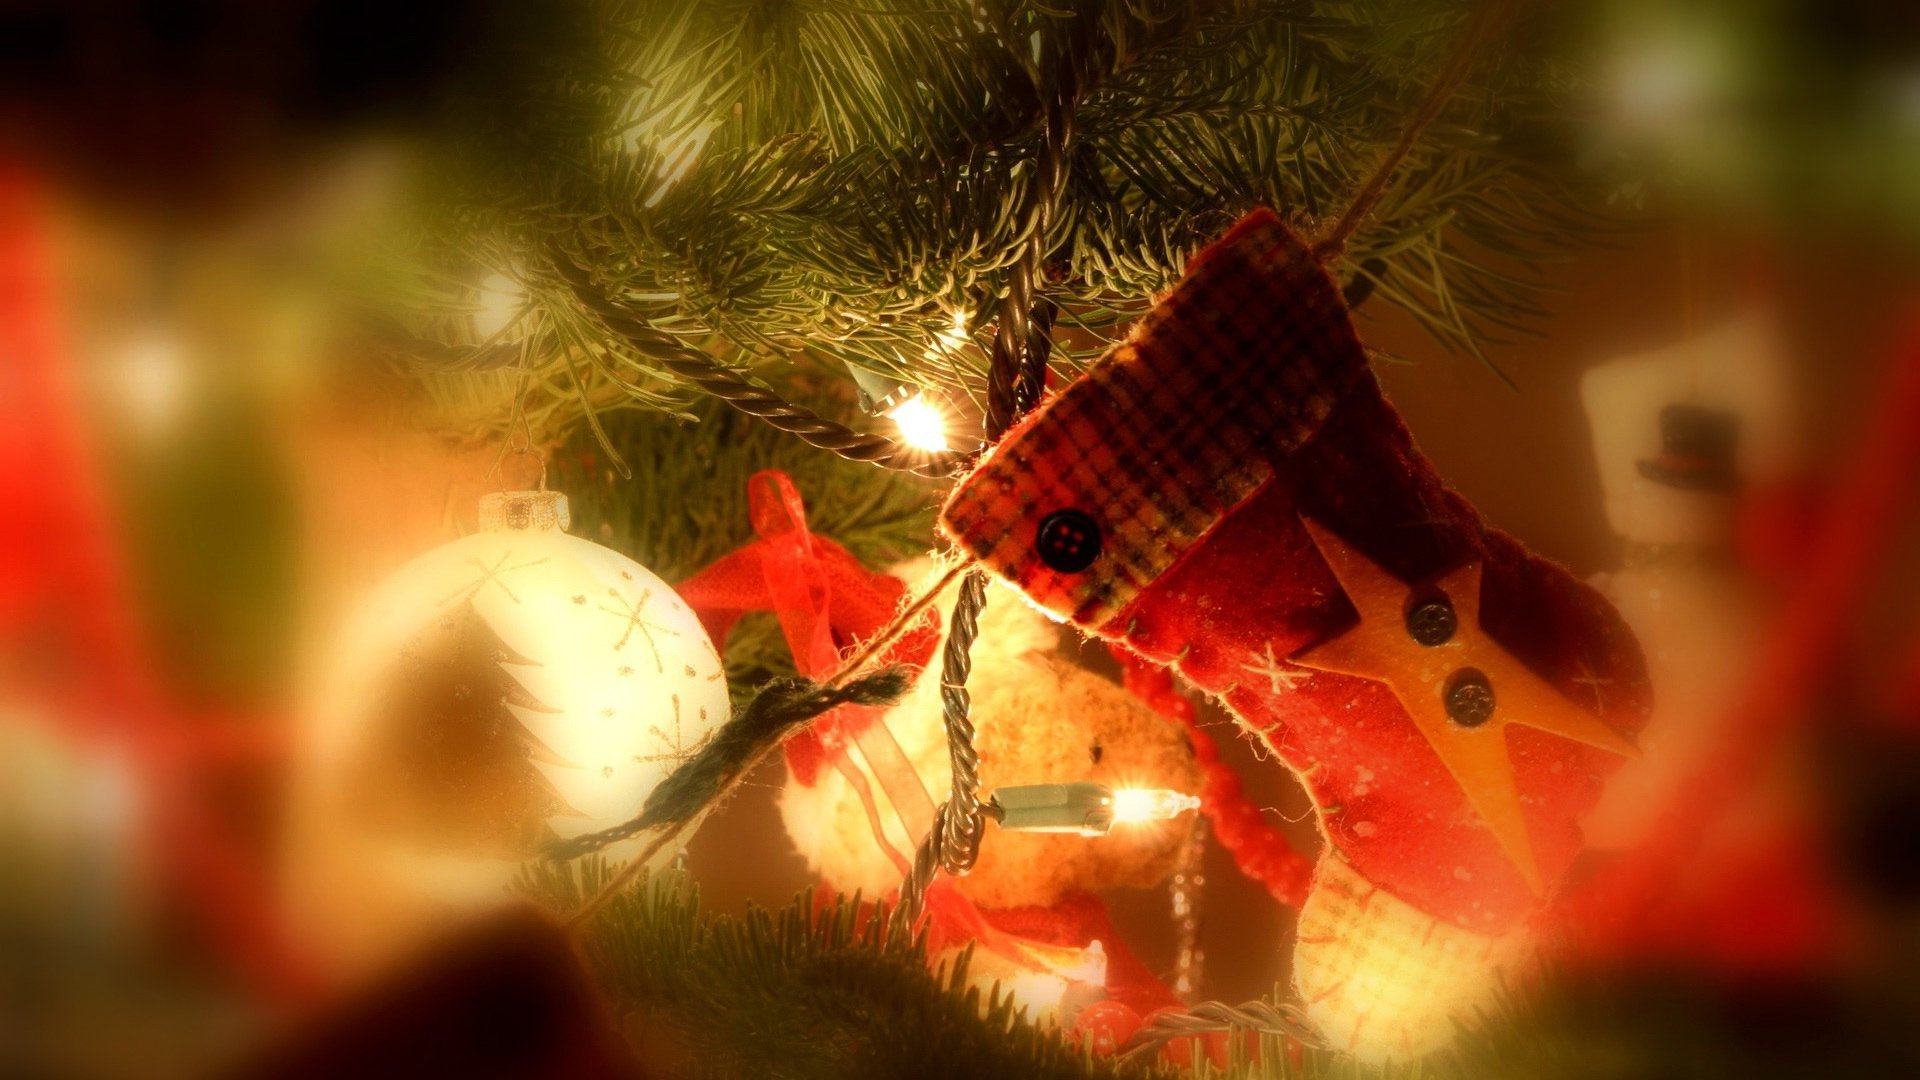 Free Download Christmas 2012 1080p 19201080 Full Hd